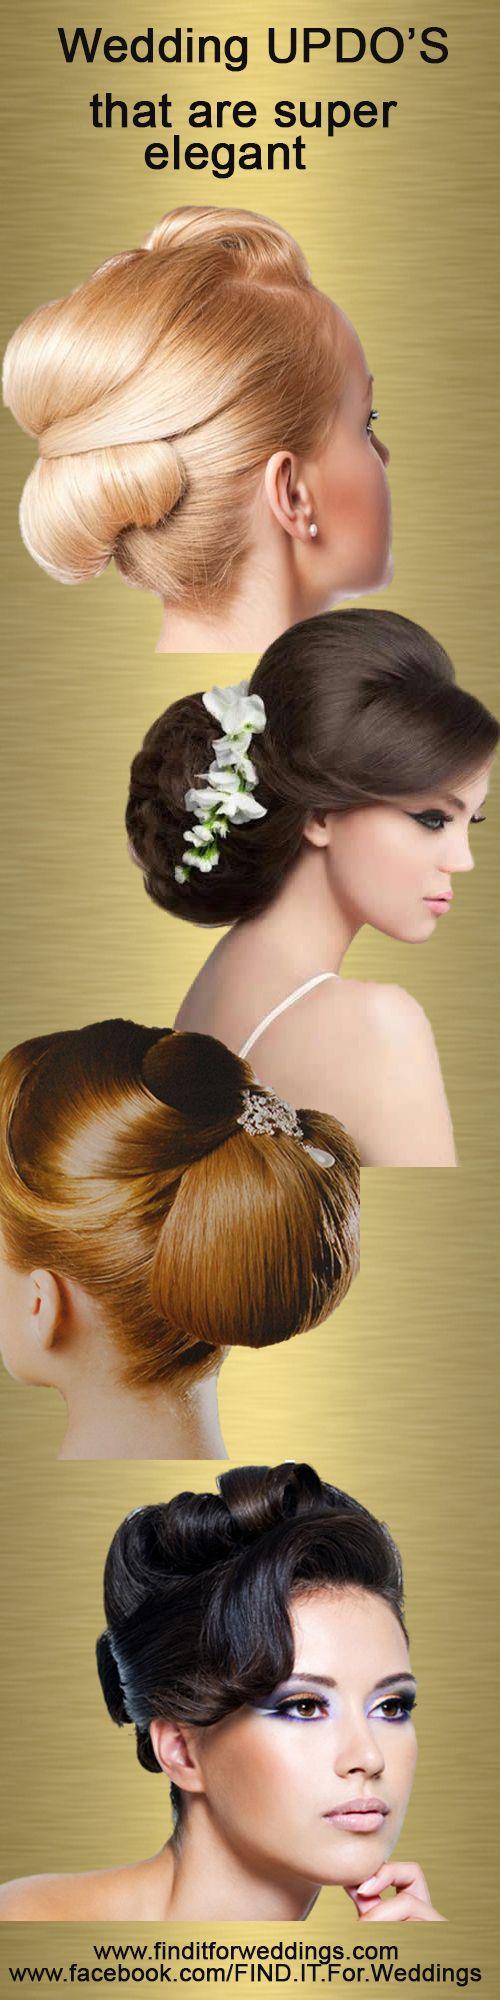 Riva coiffure facebook